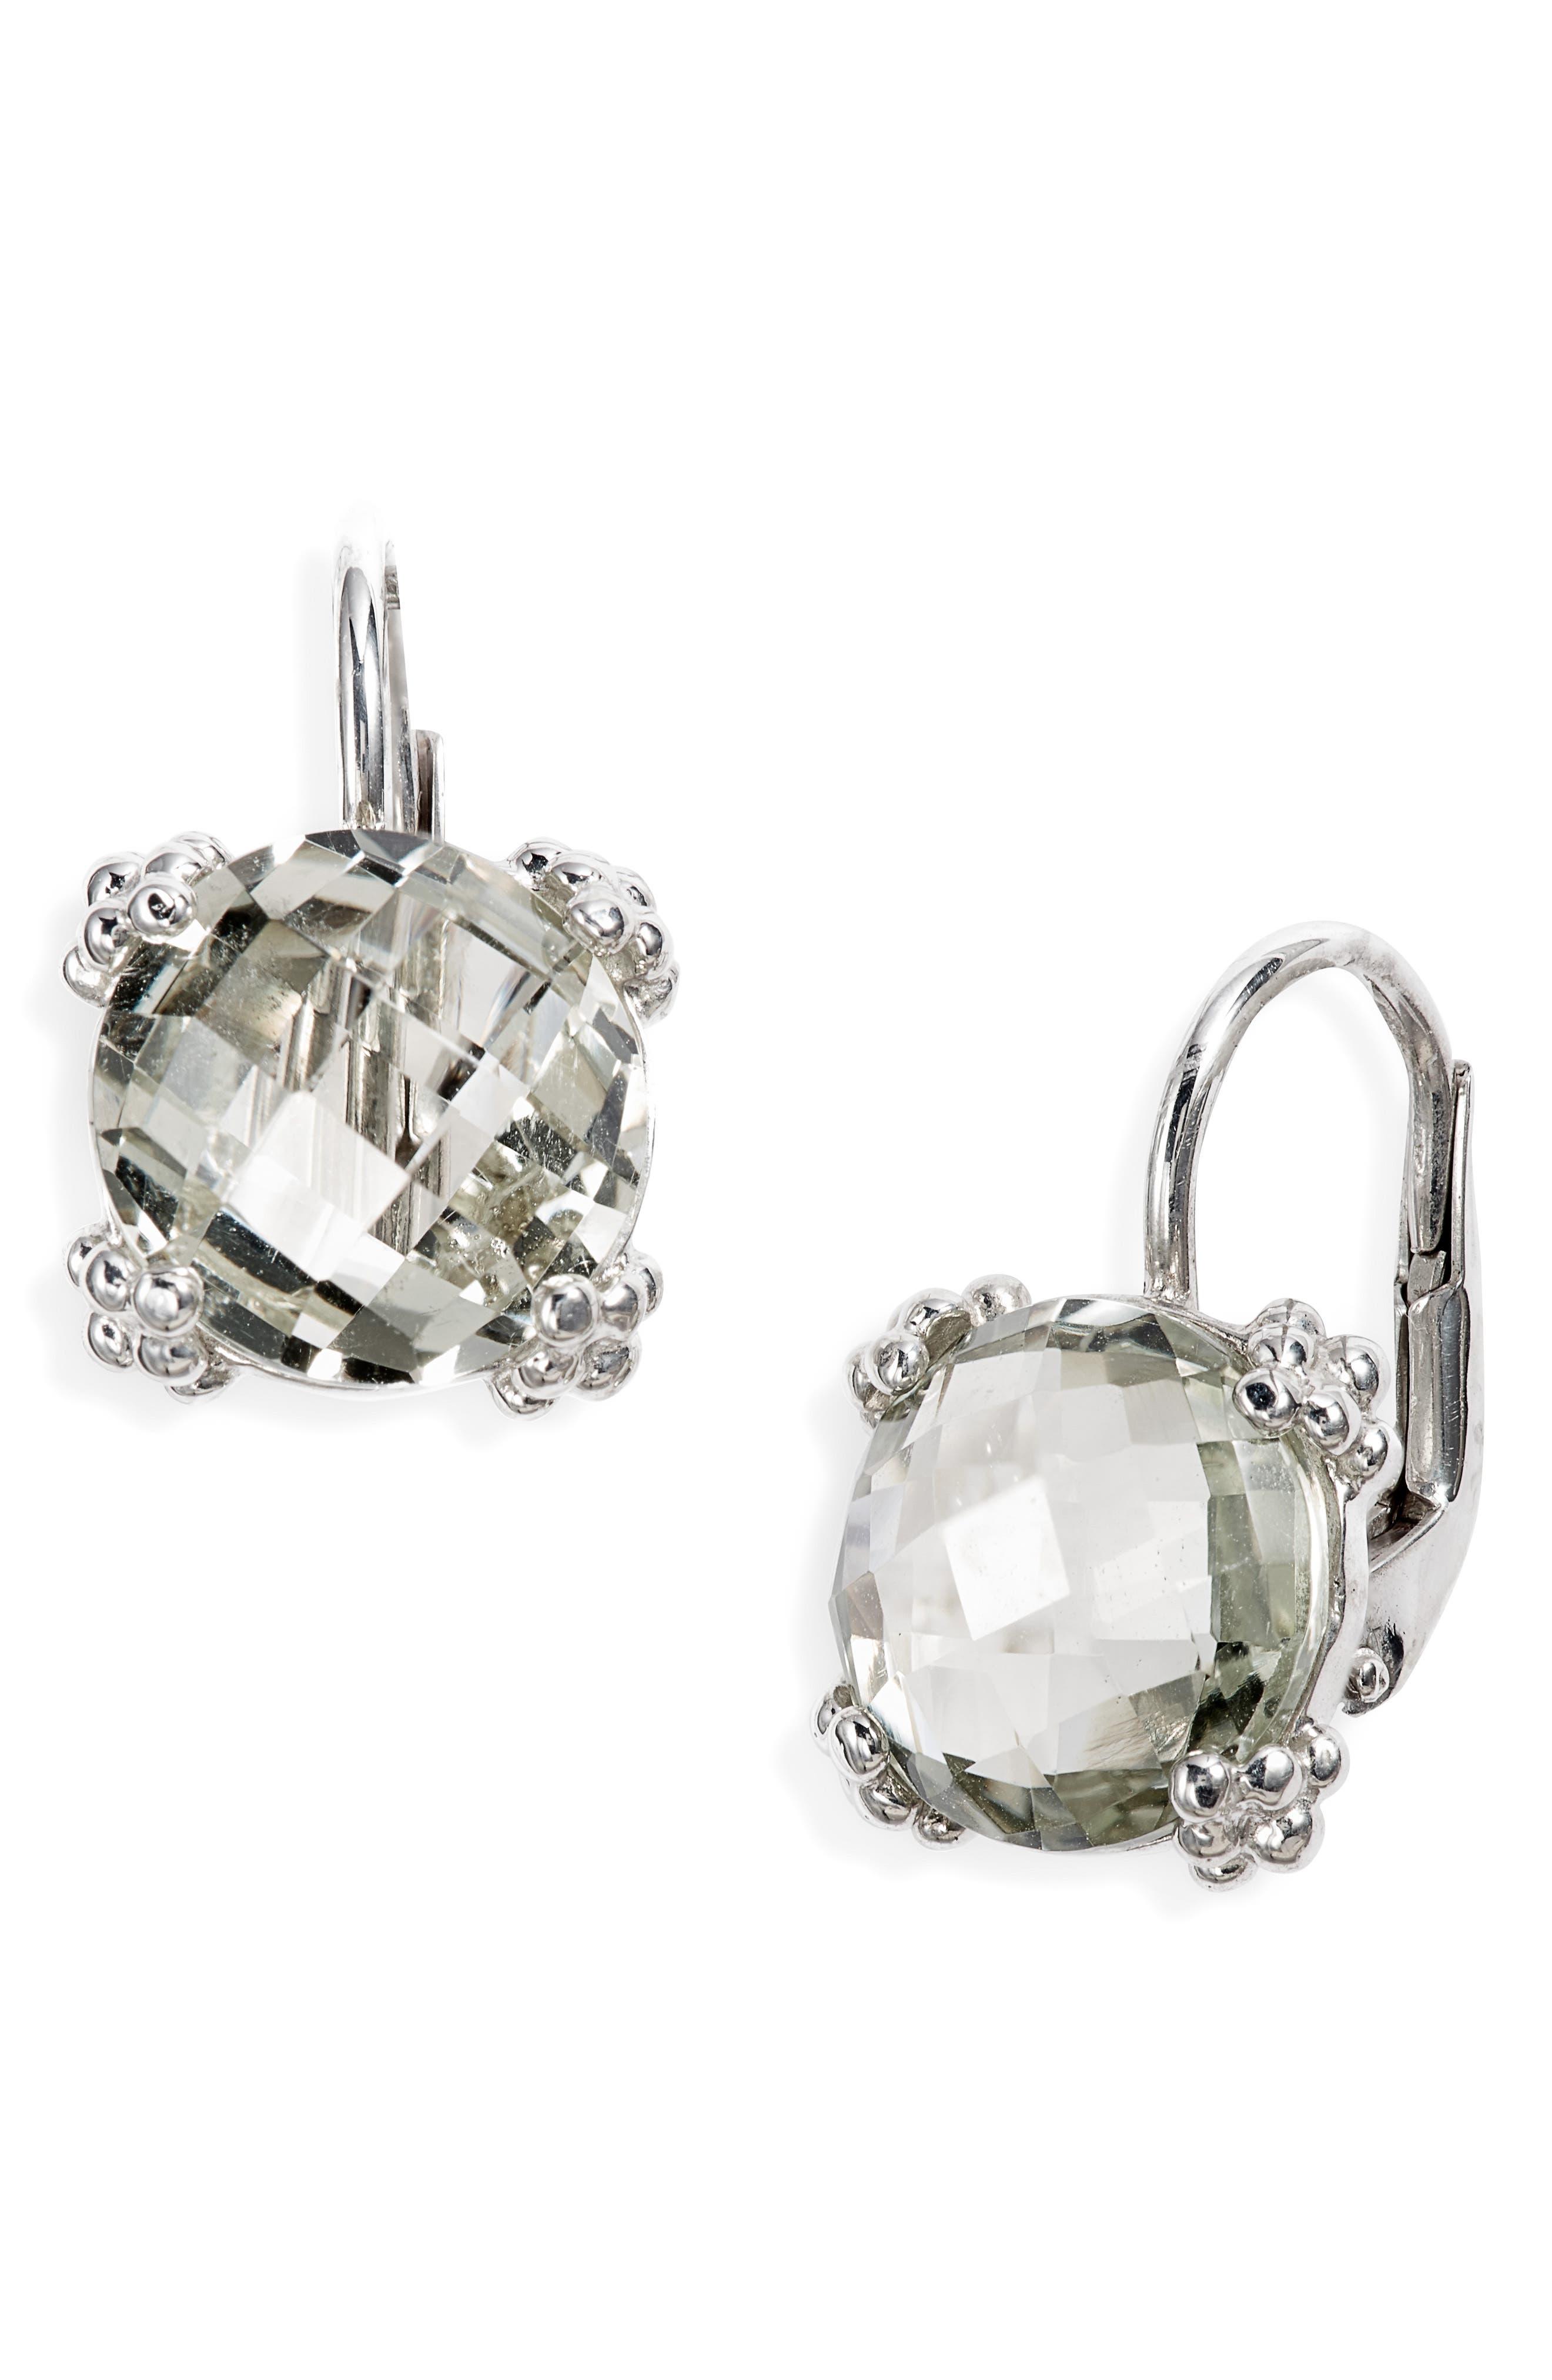 Dewdrop Topaz Drop Earrings,                             Main thumbnail 1, color,                             GREEN AMETHYST